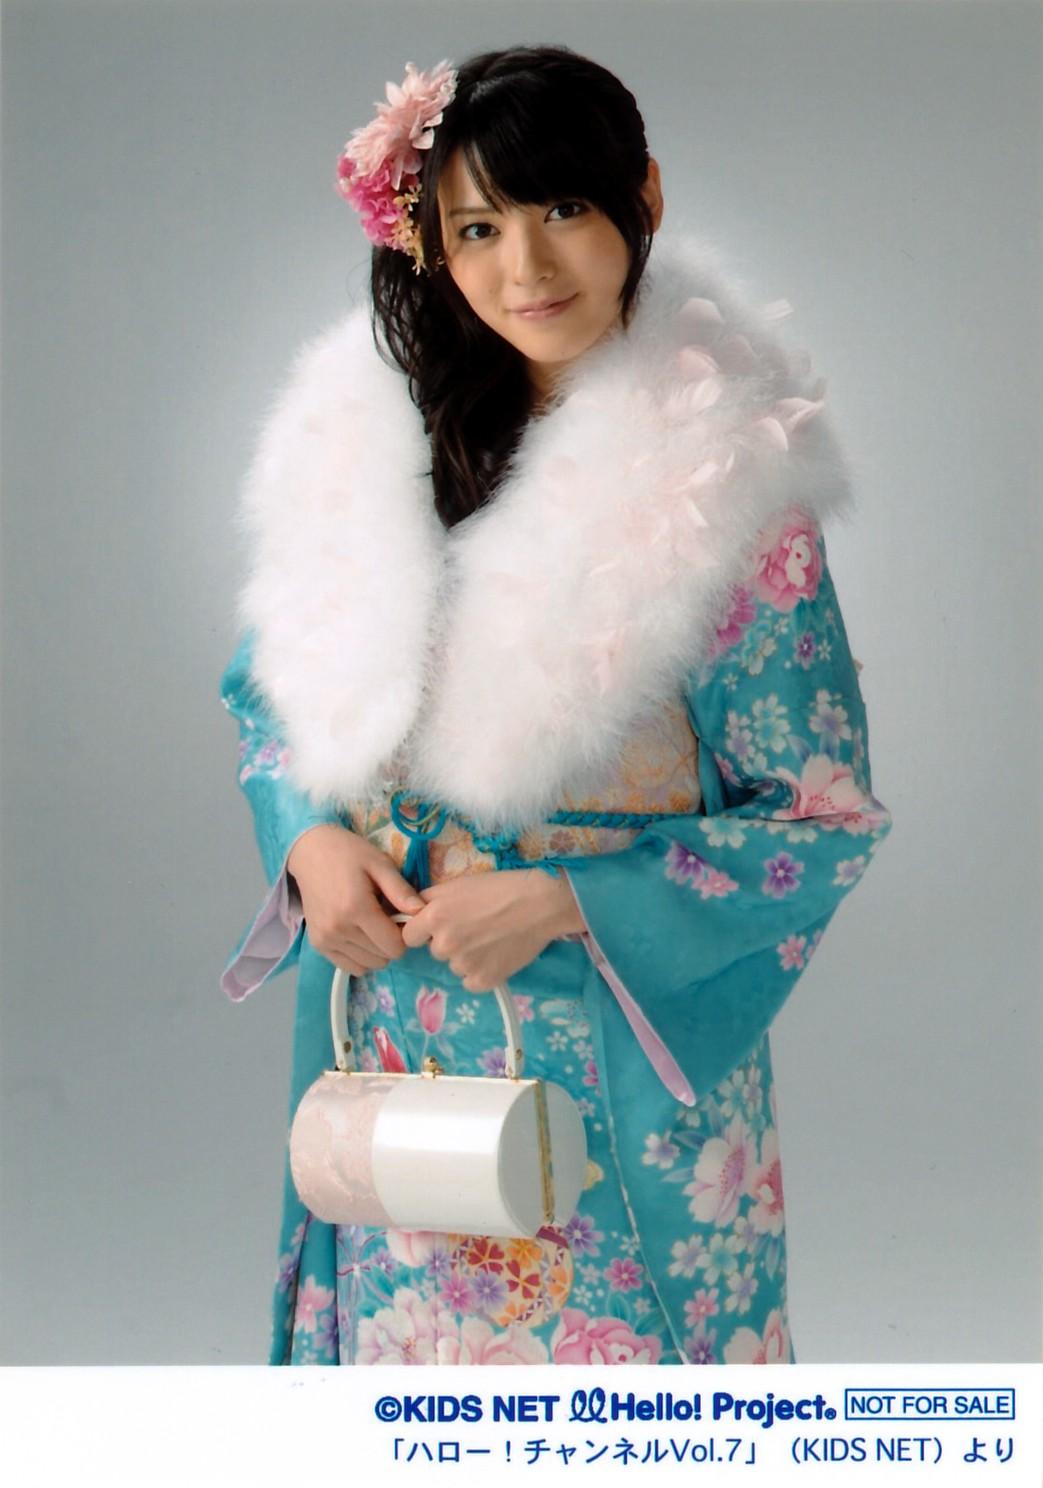 PINKのお花の髪飾り 青地に花柄の晴れ着 矢島舞美 2